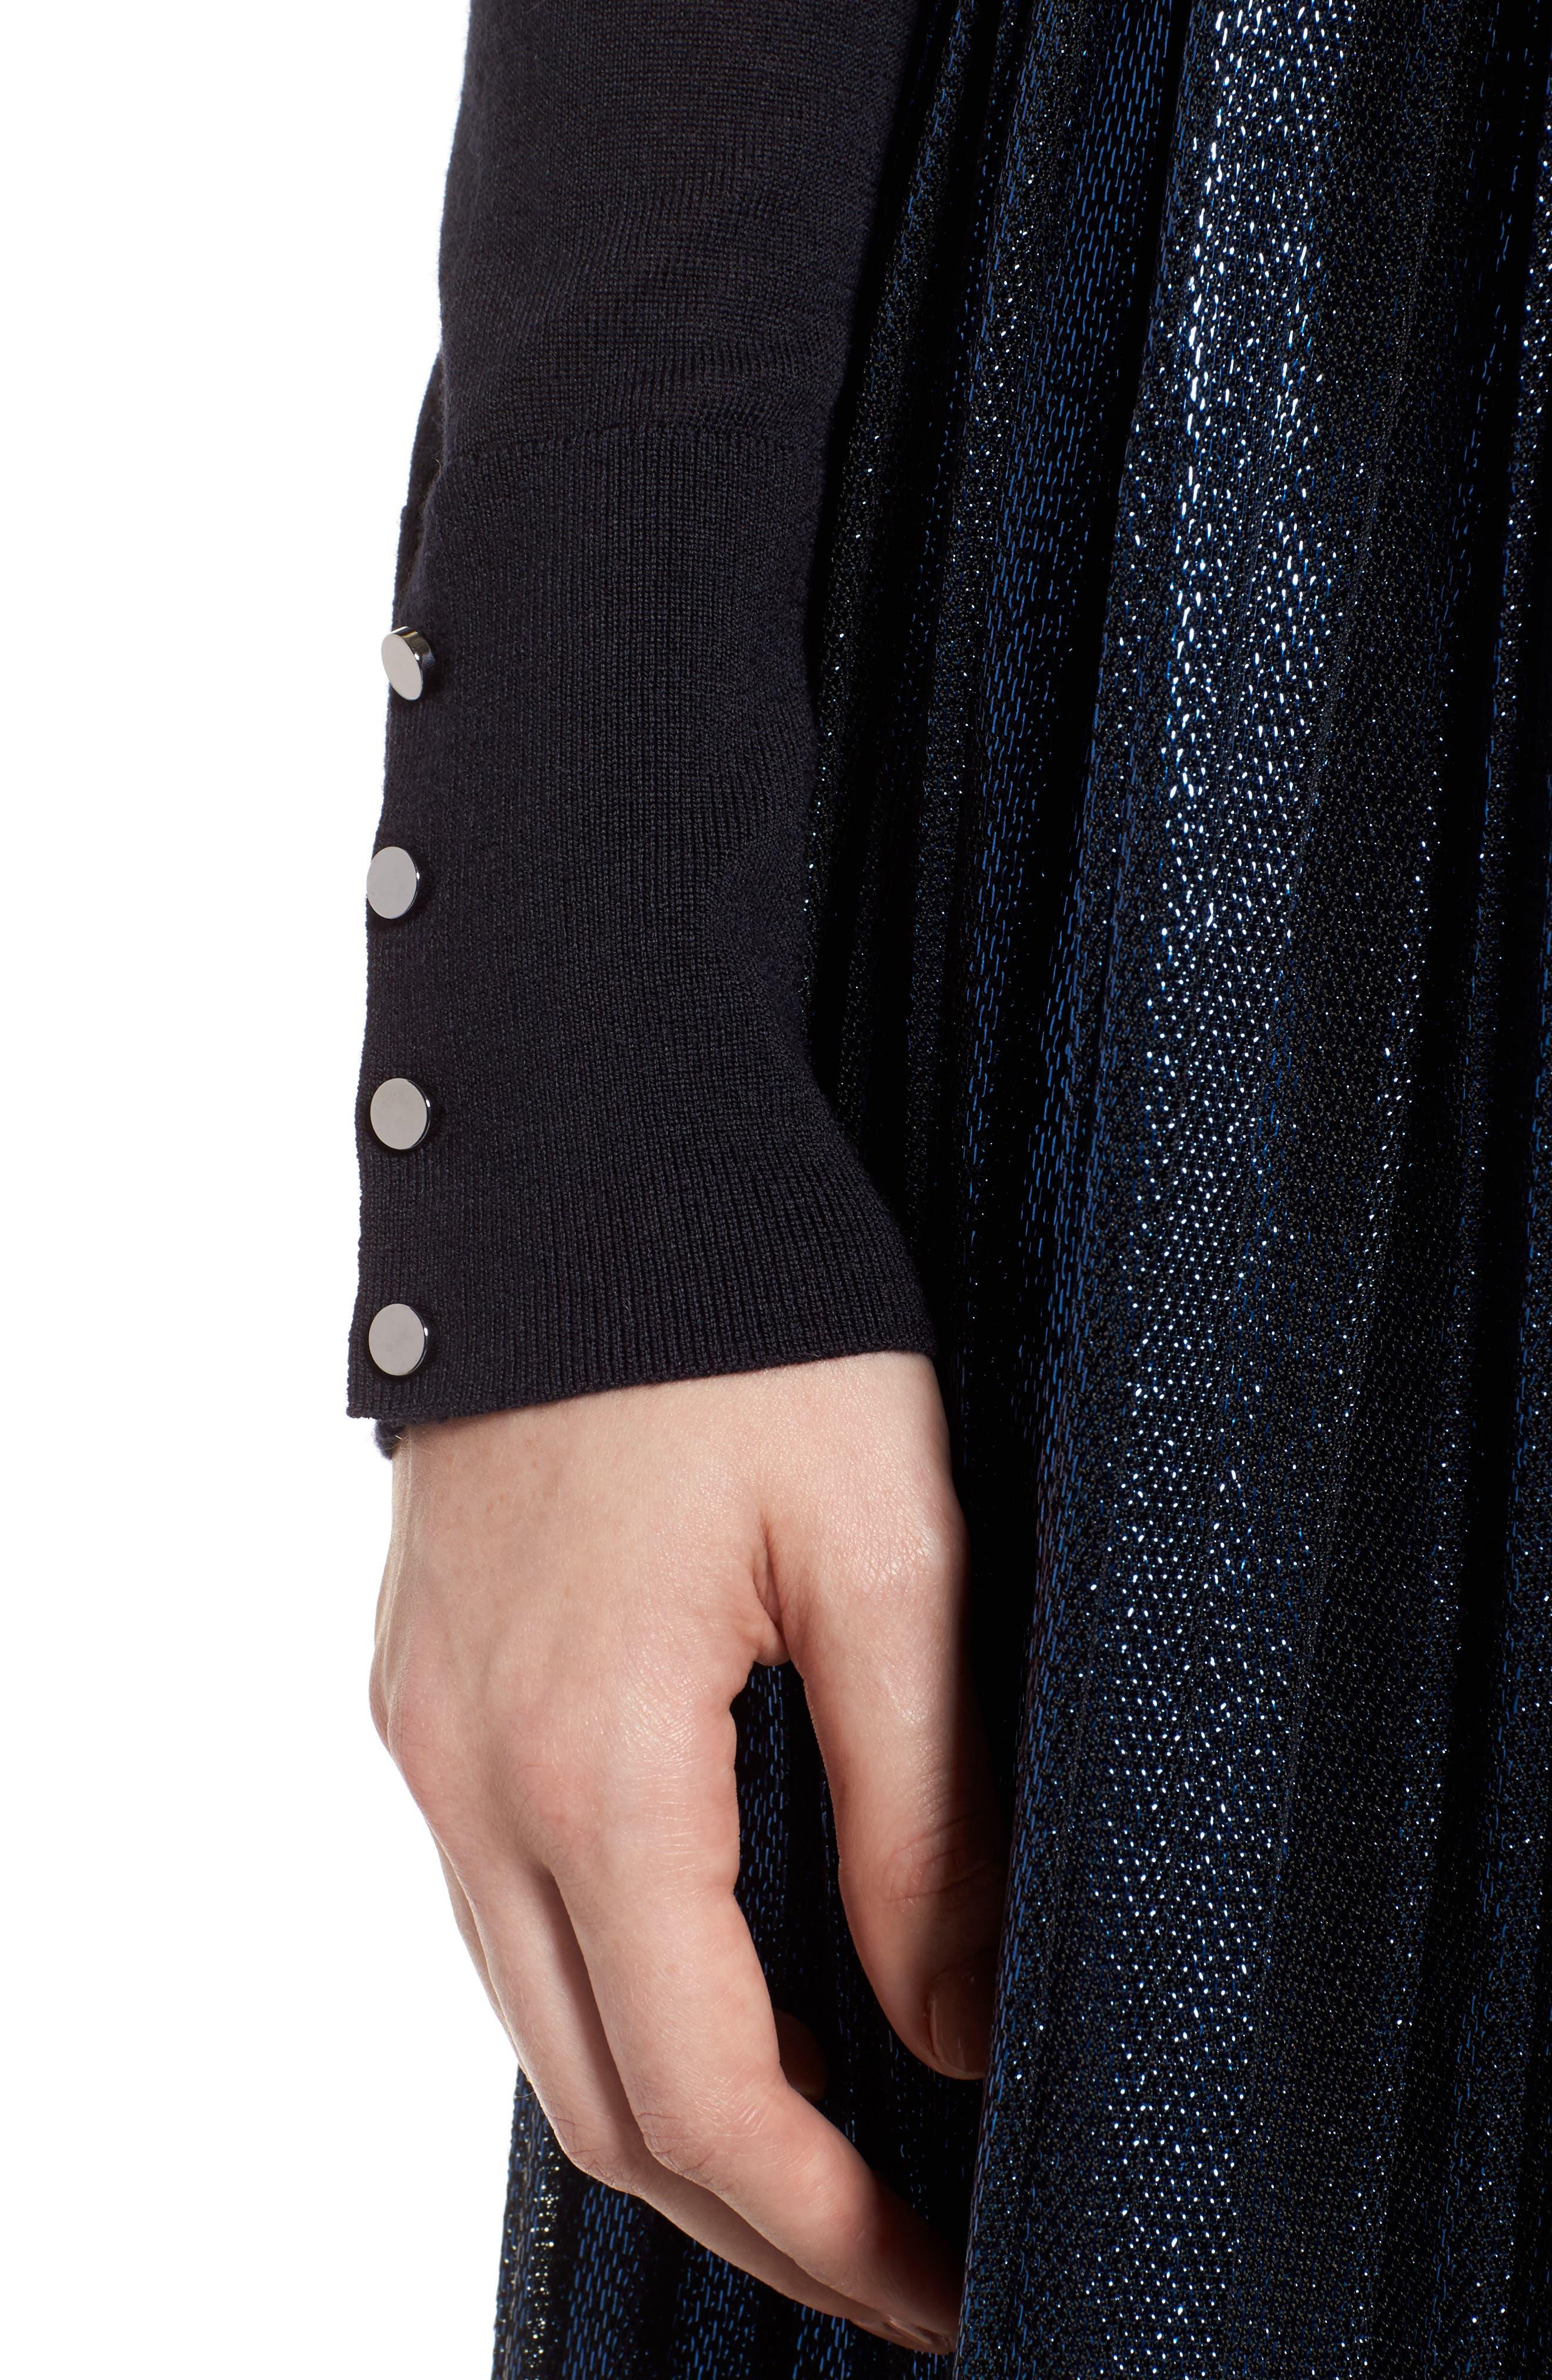 Farrella Wool Turtleneck Sweater,                             Alternate thumbnail 4, color,                             480